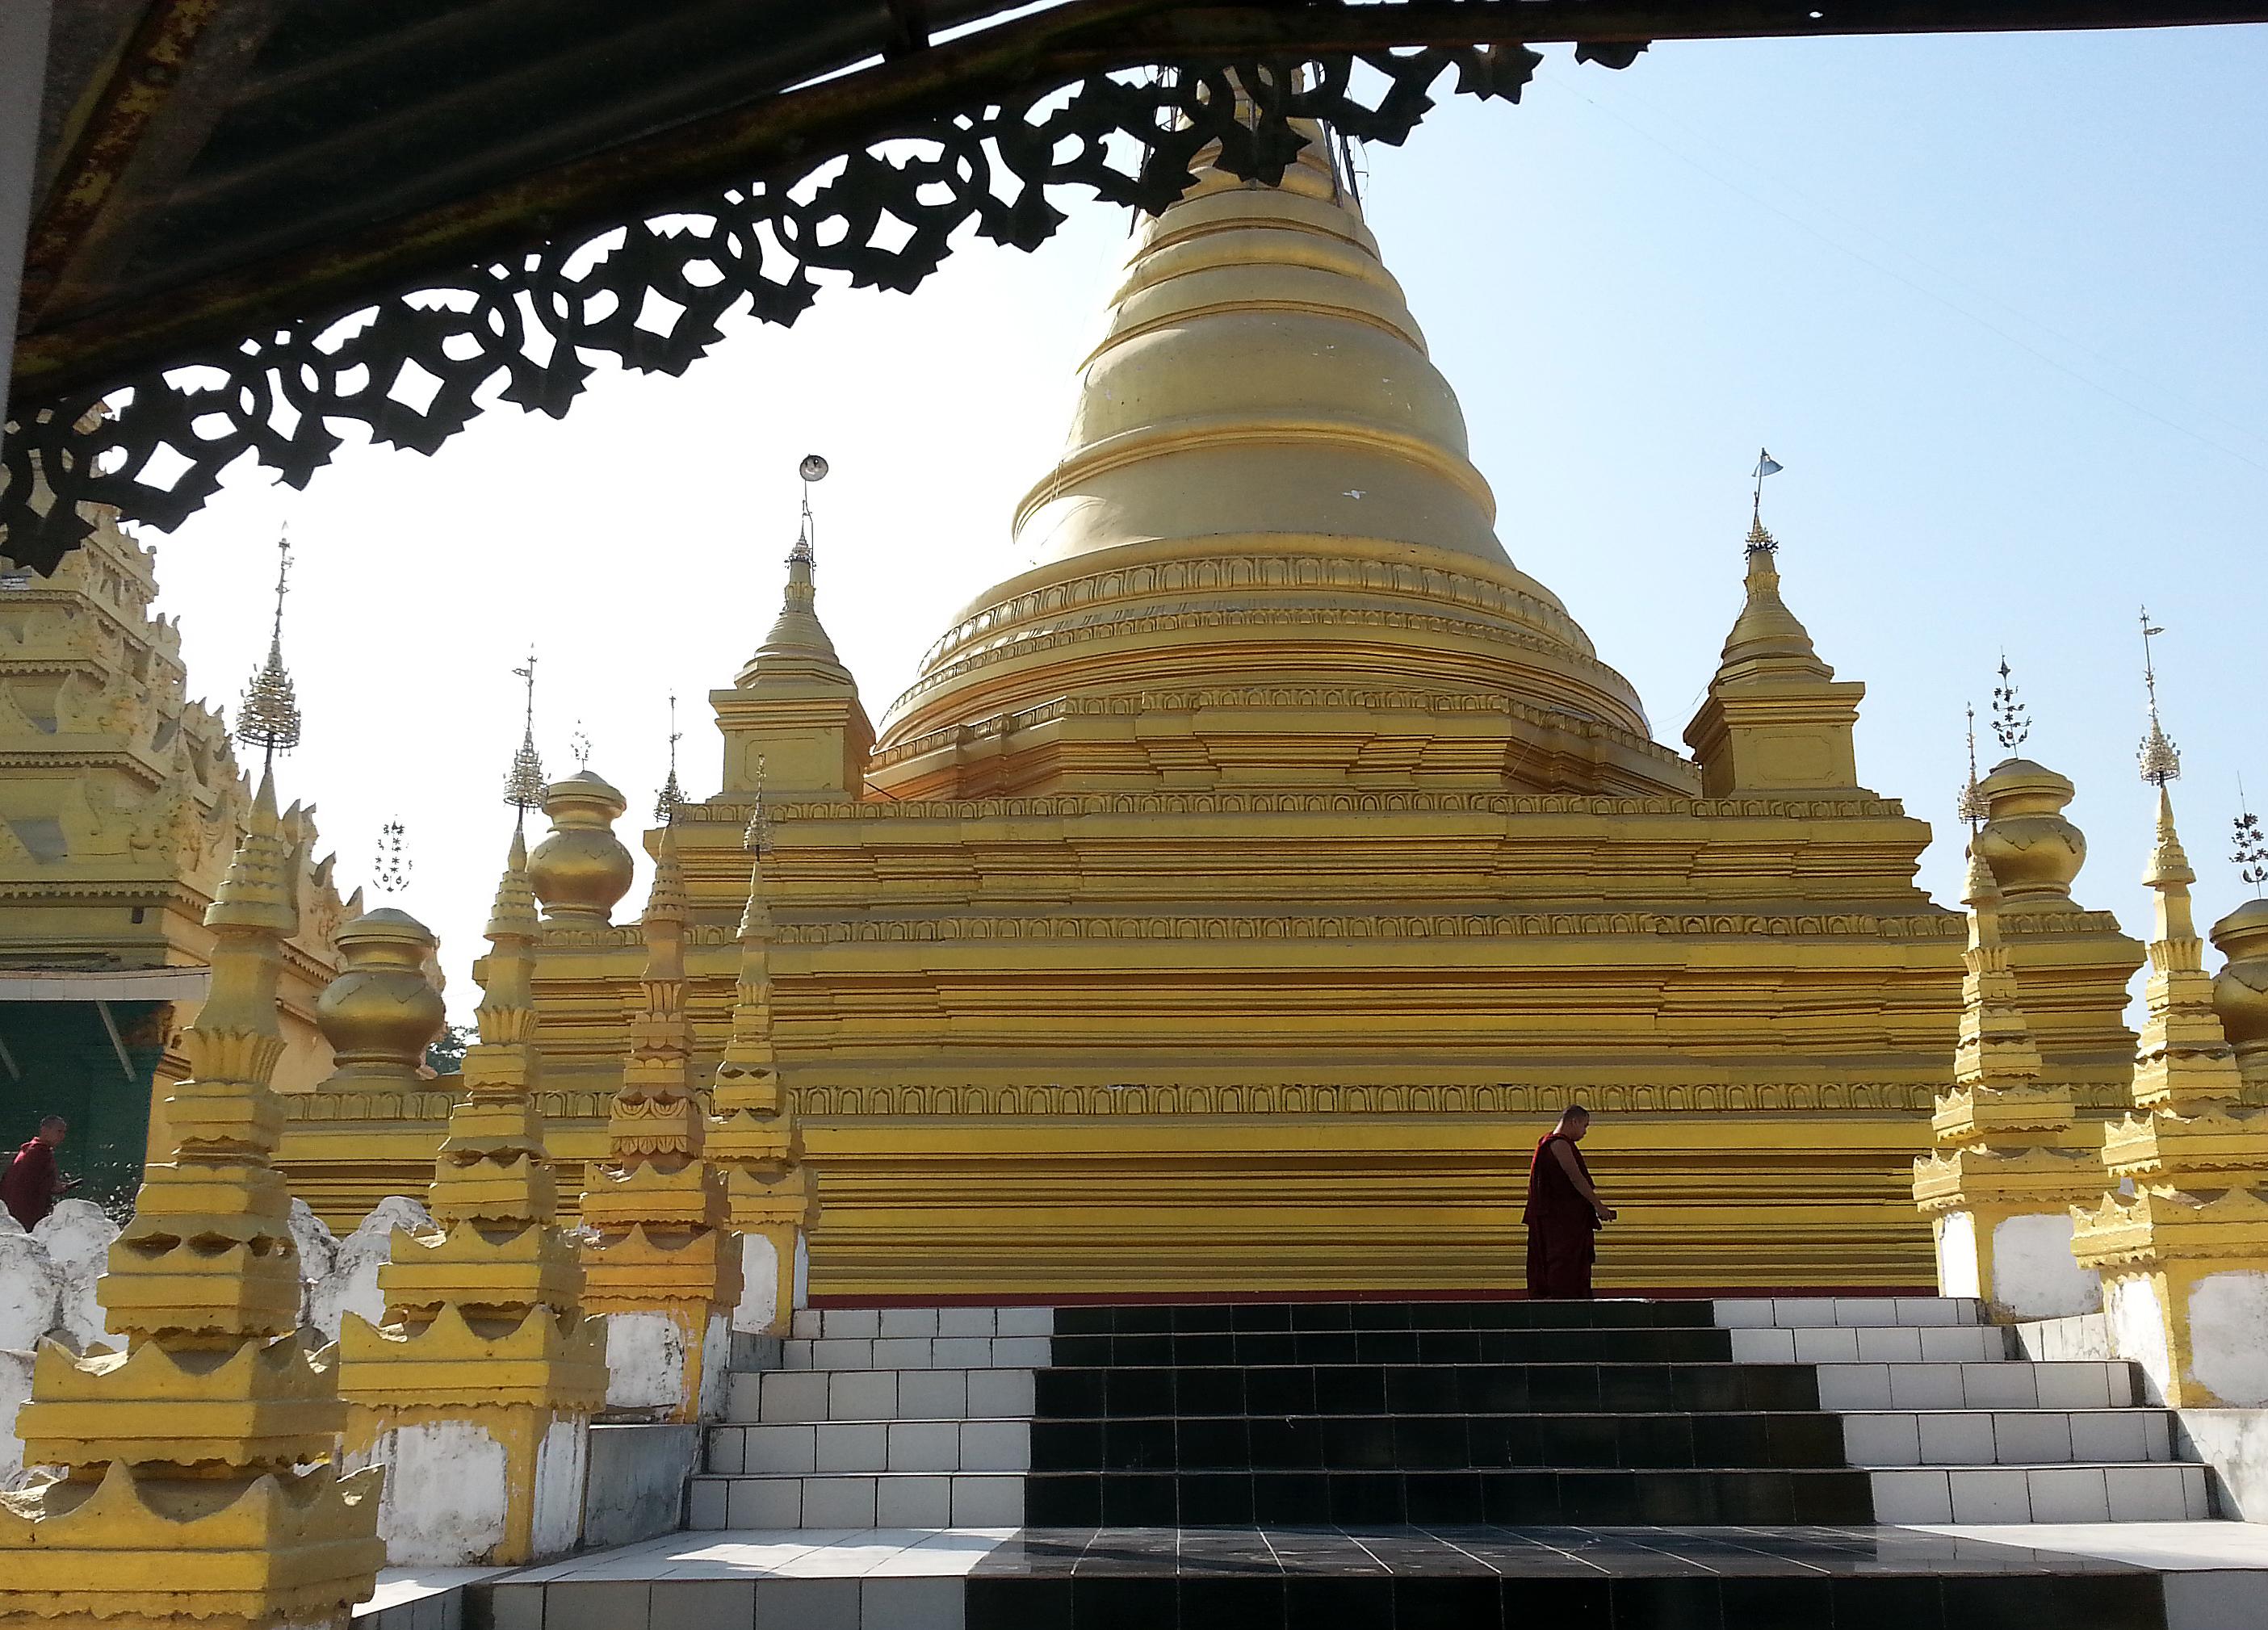 Kuthudaw Pagoda